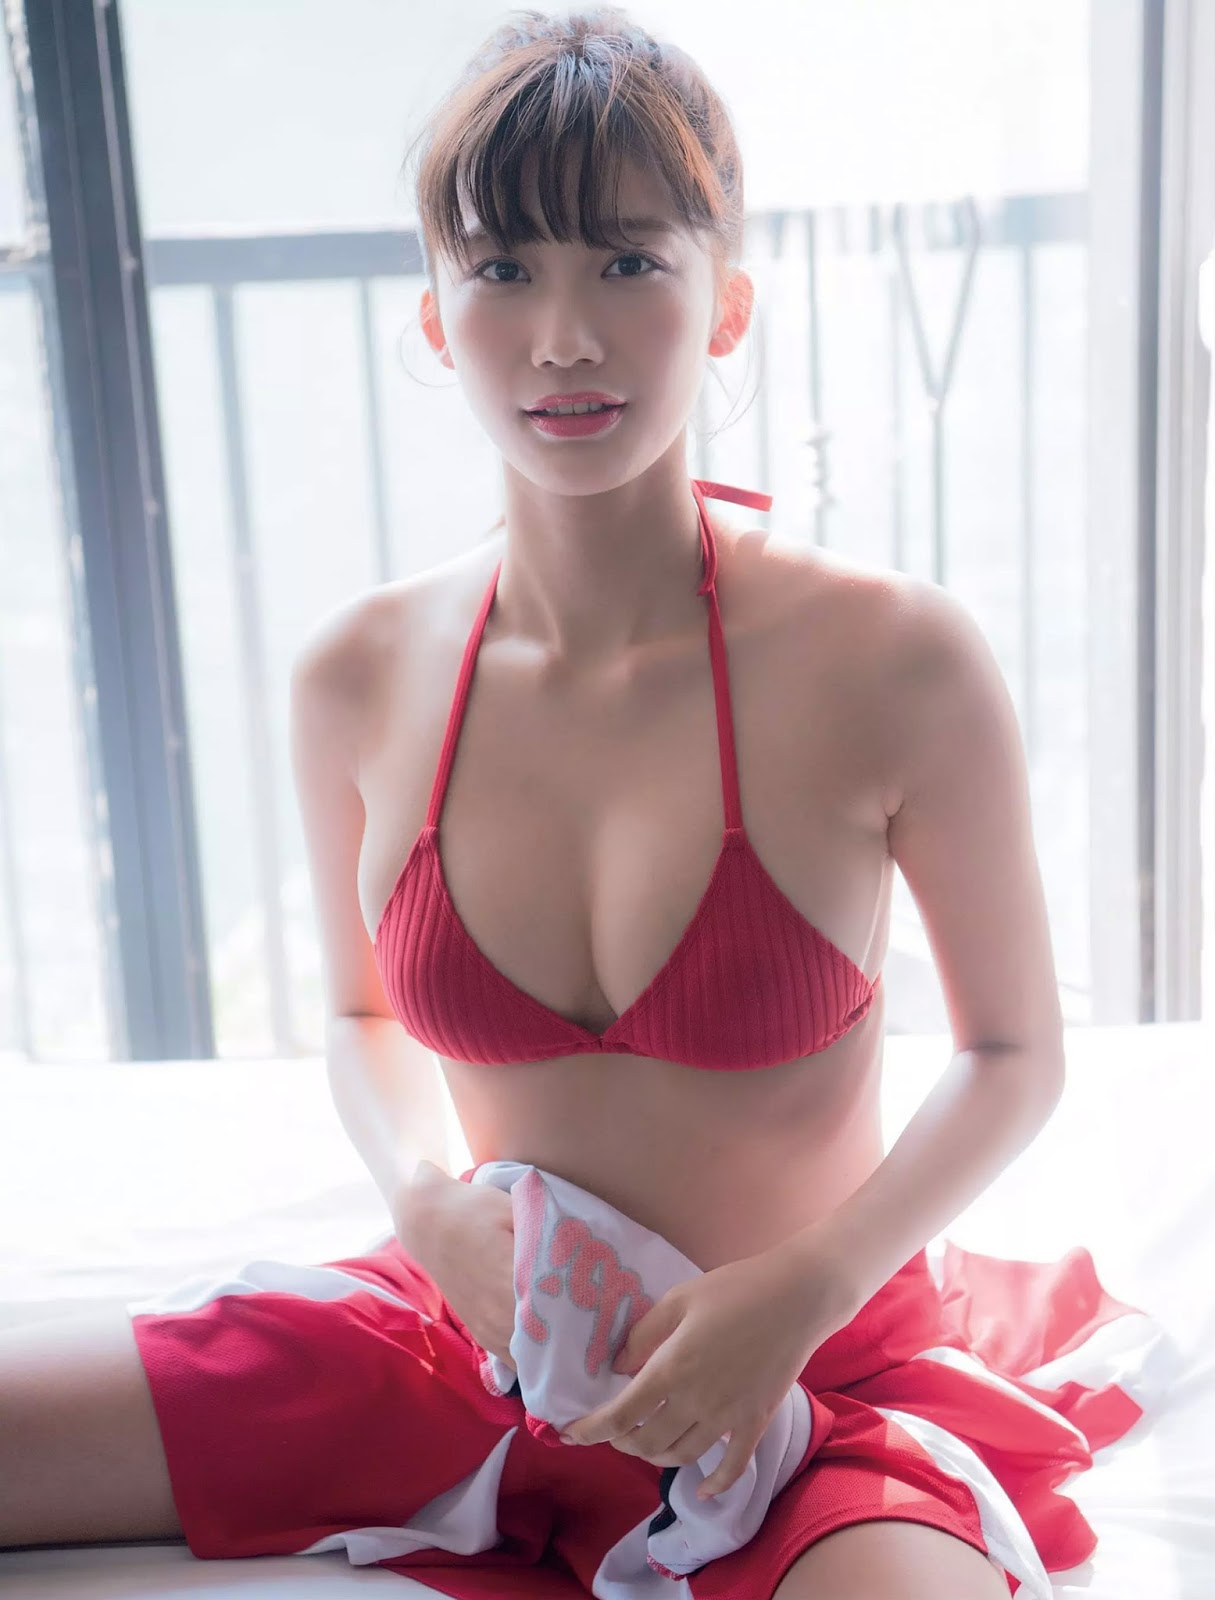 Yuka Ogura 小倉優香, FLASH 電子版 2017.12.05 Part.02 (フラッシュ 2017年12月05日号)